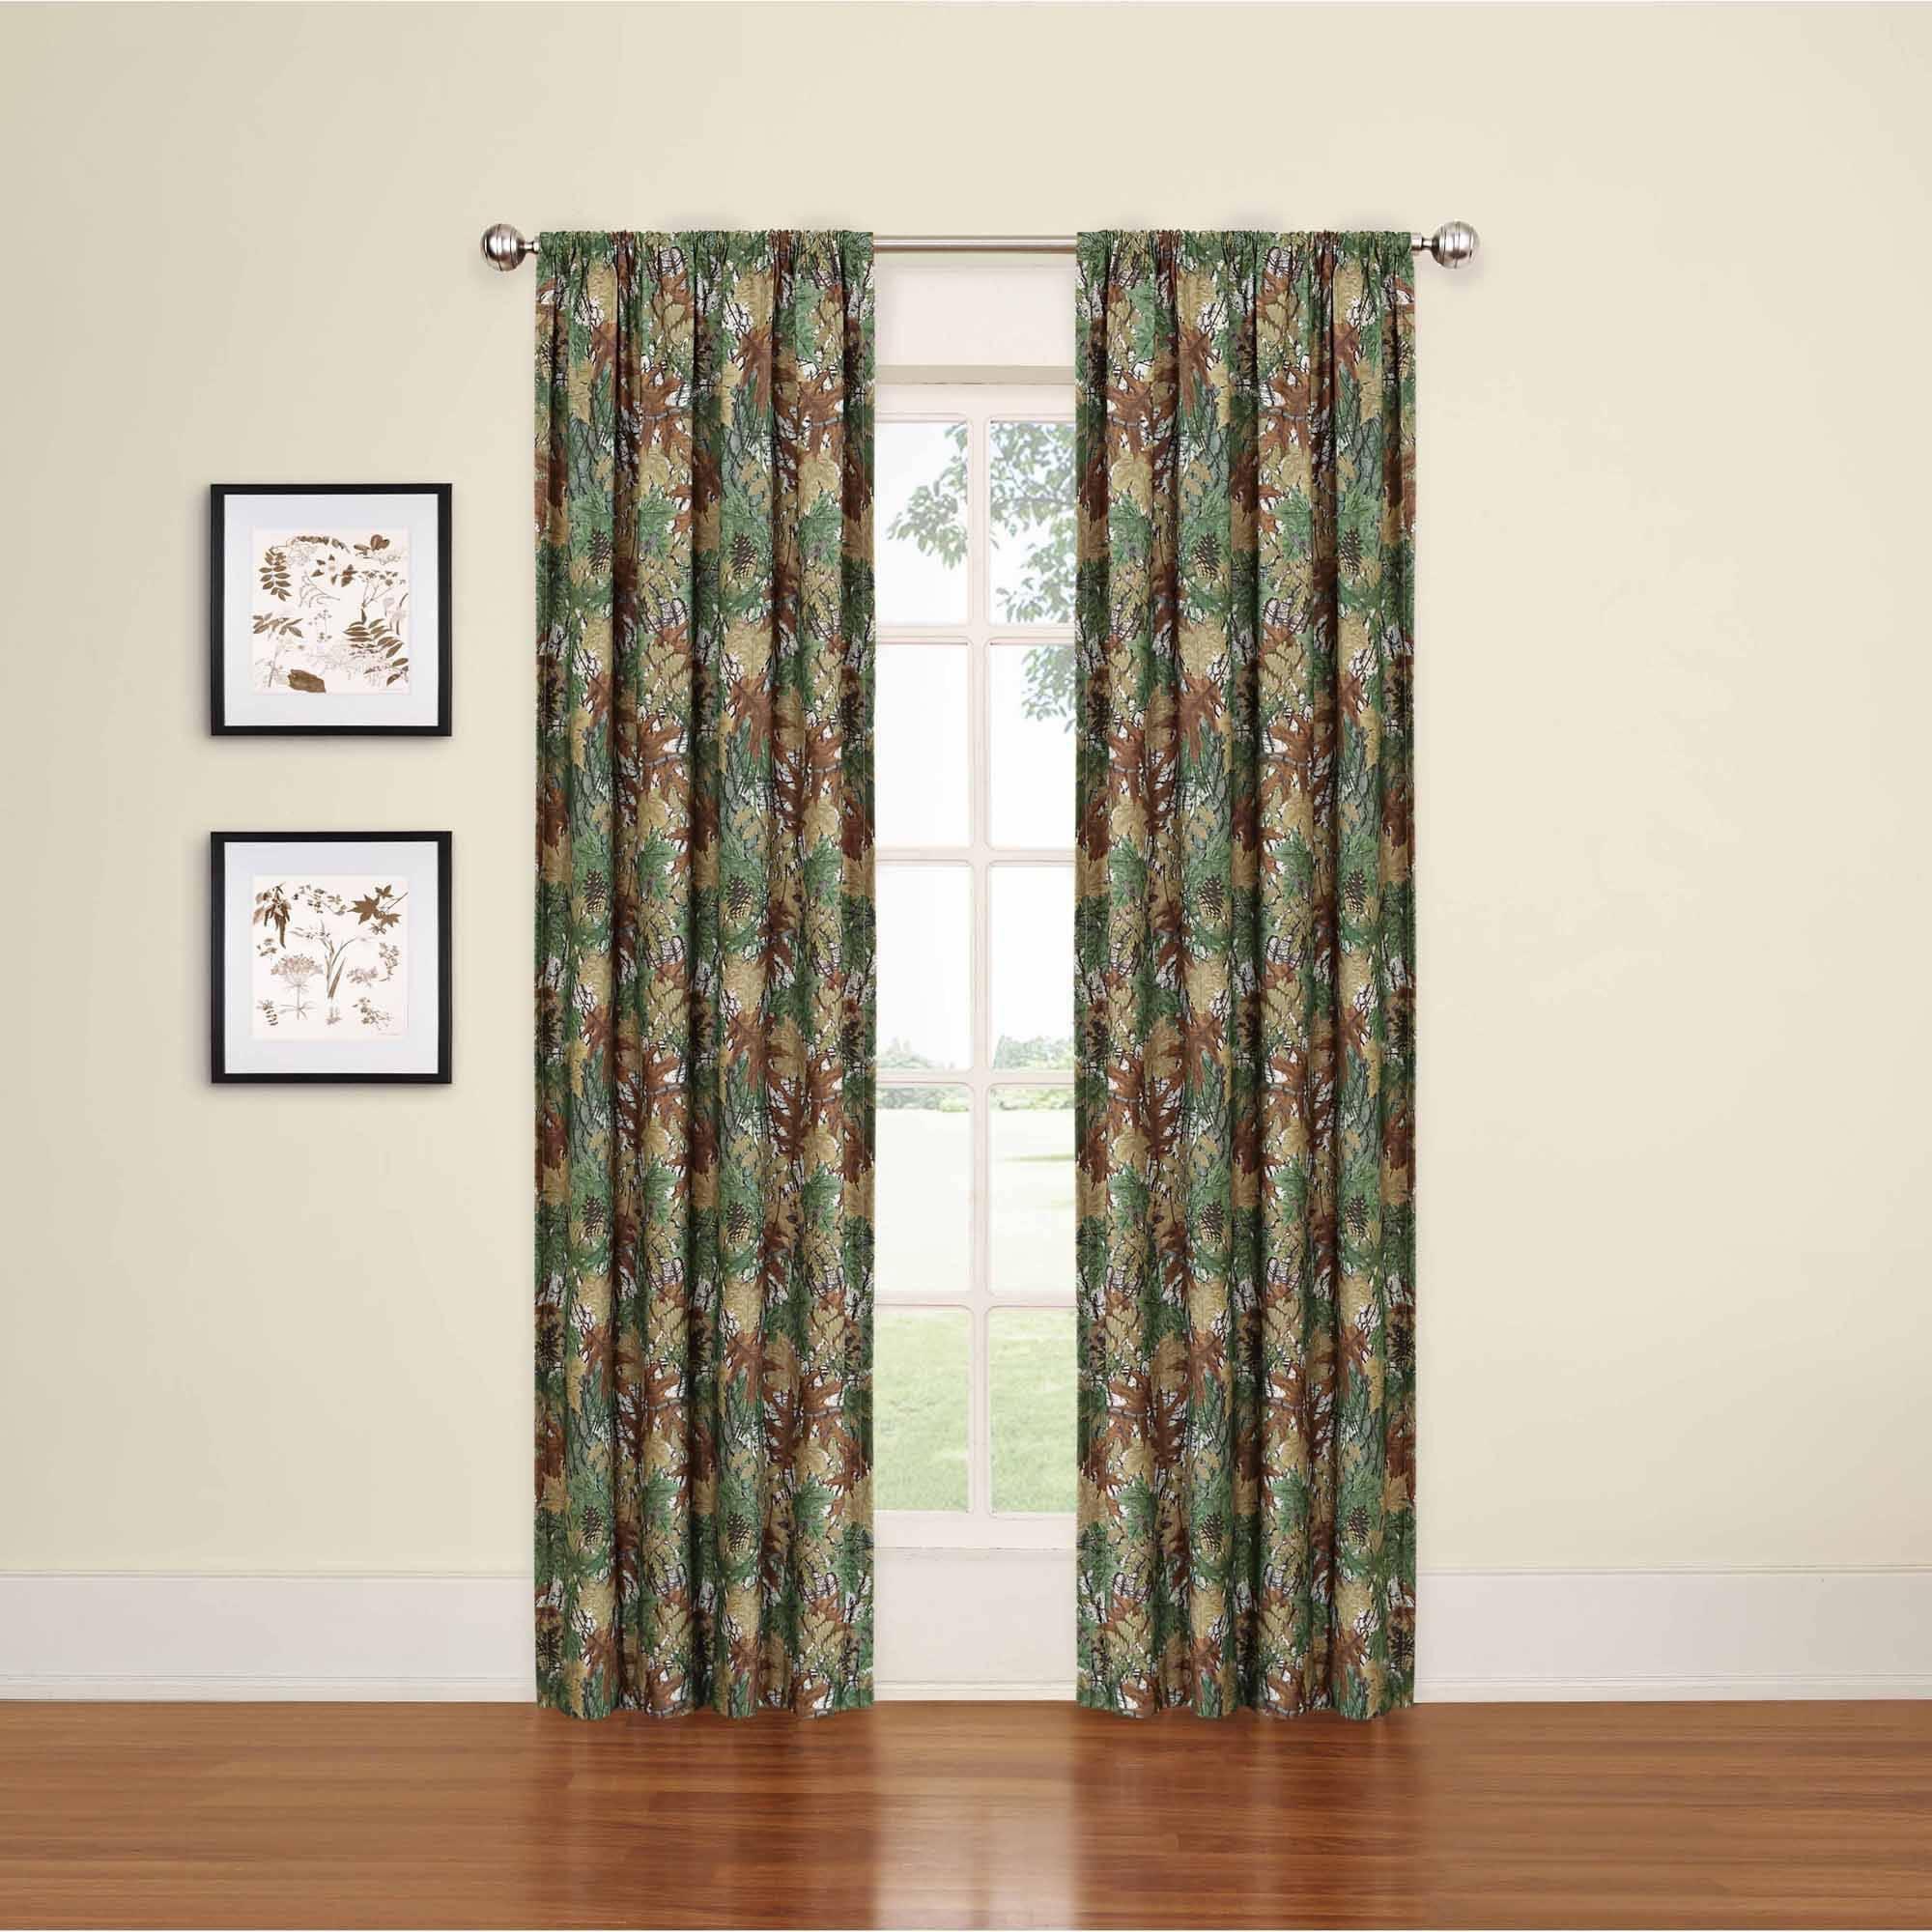 25 Photos 63 Inches Long Curtains  Curtain Ideas